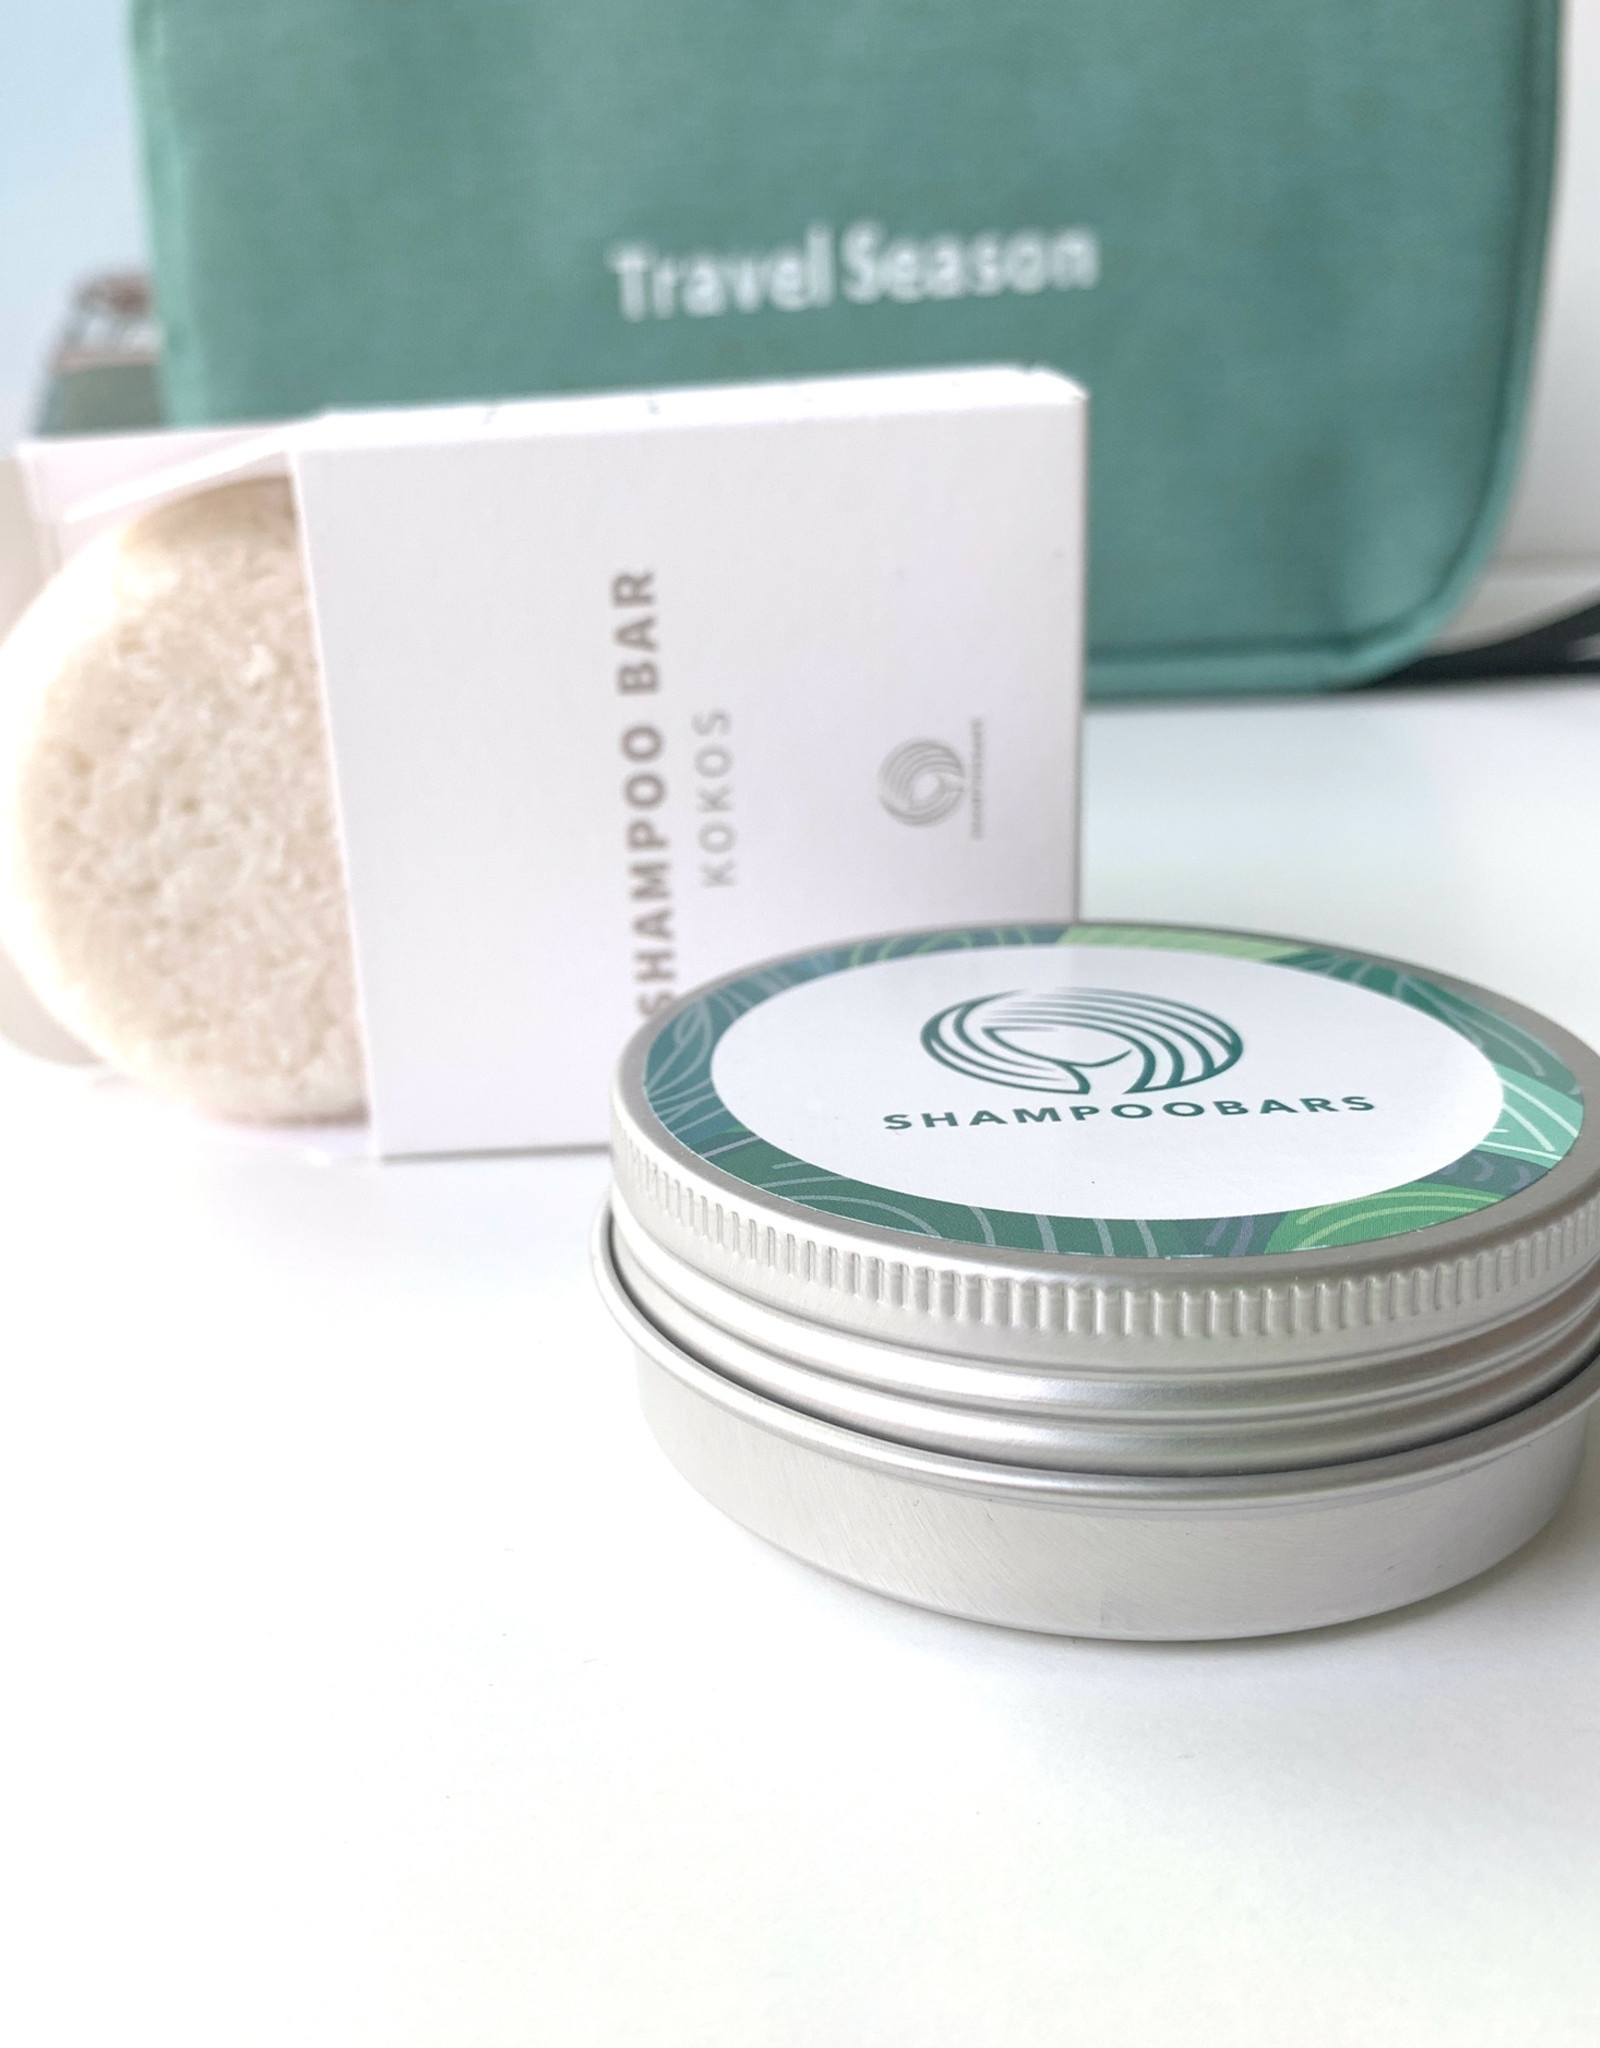 Cadeau -  Travelset voor campers